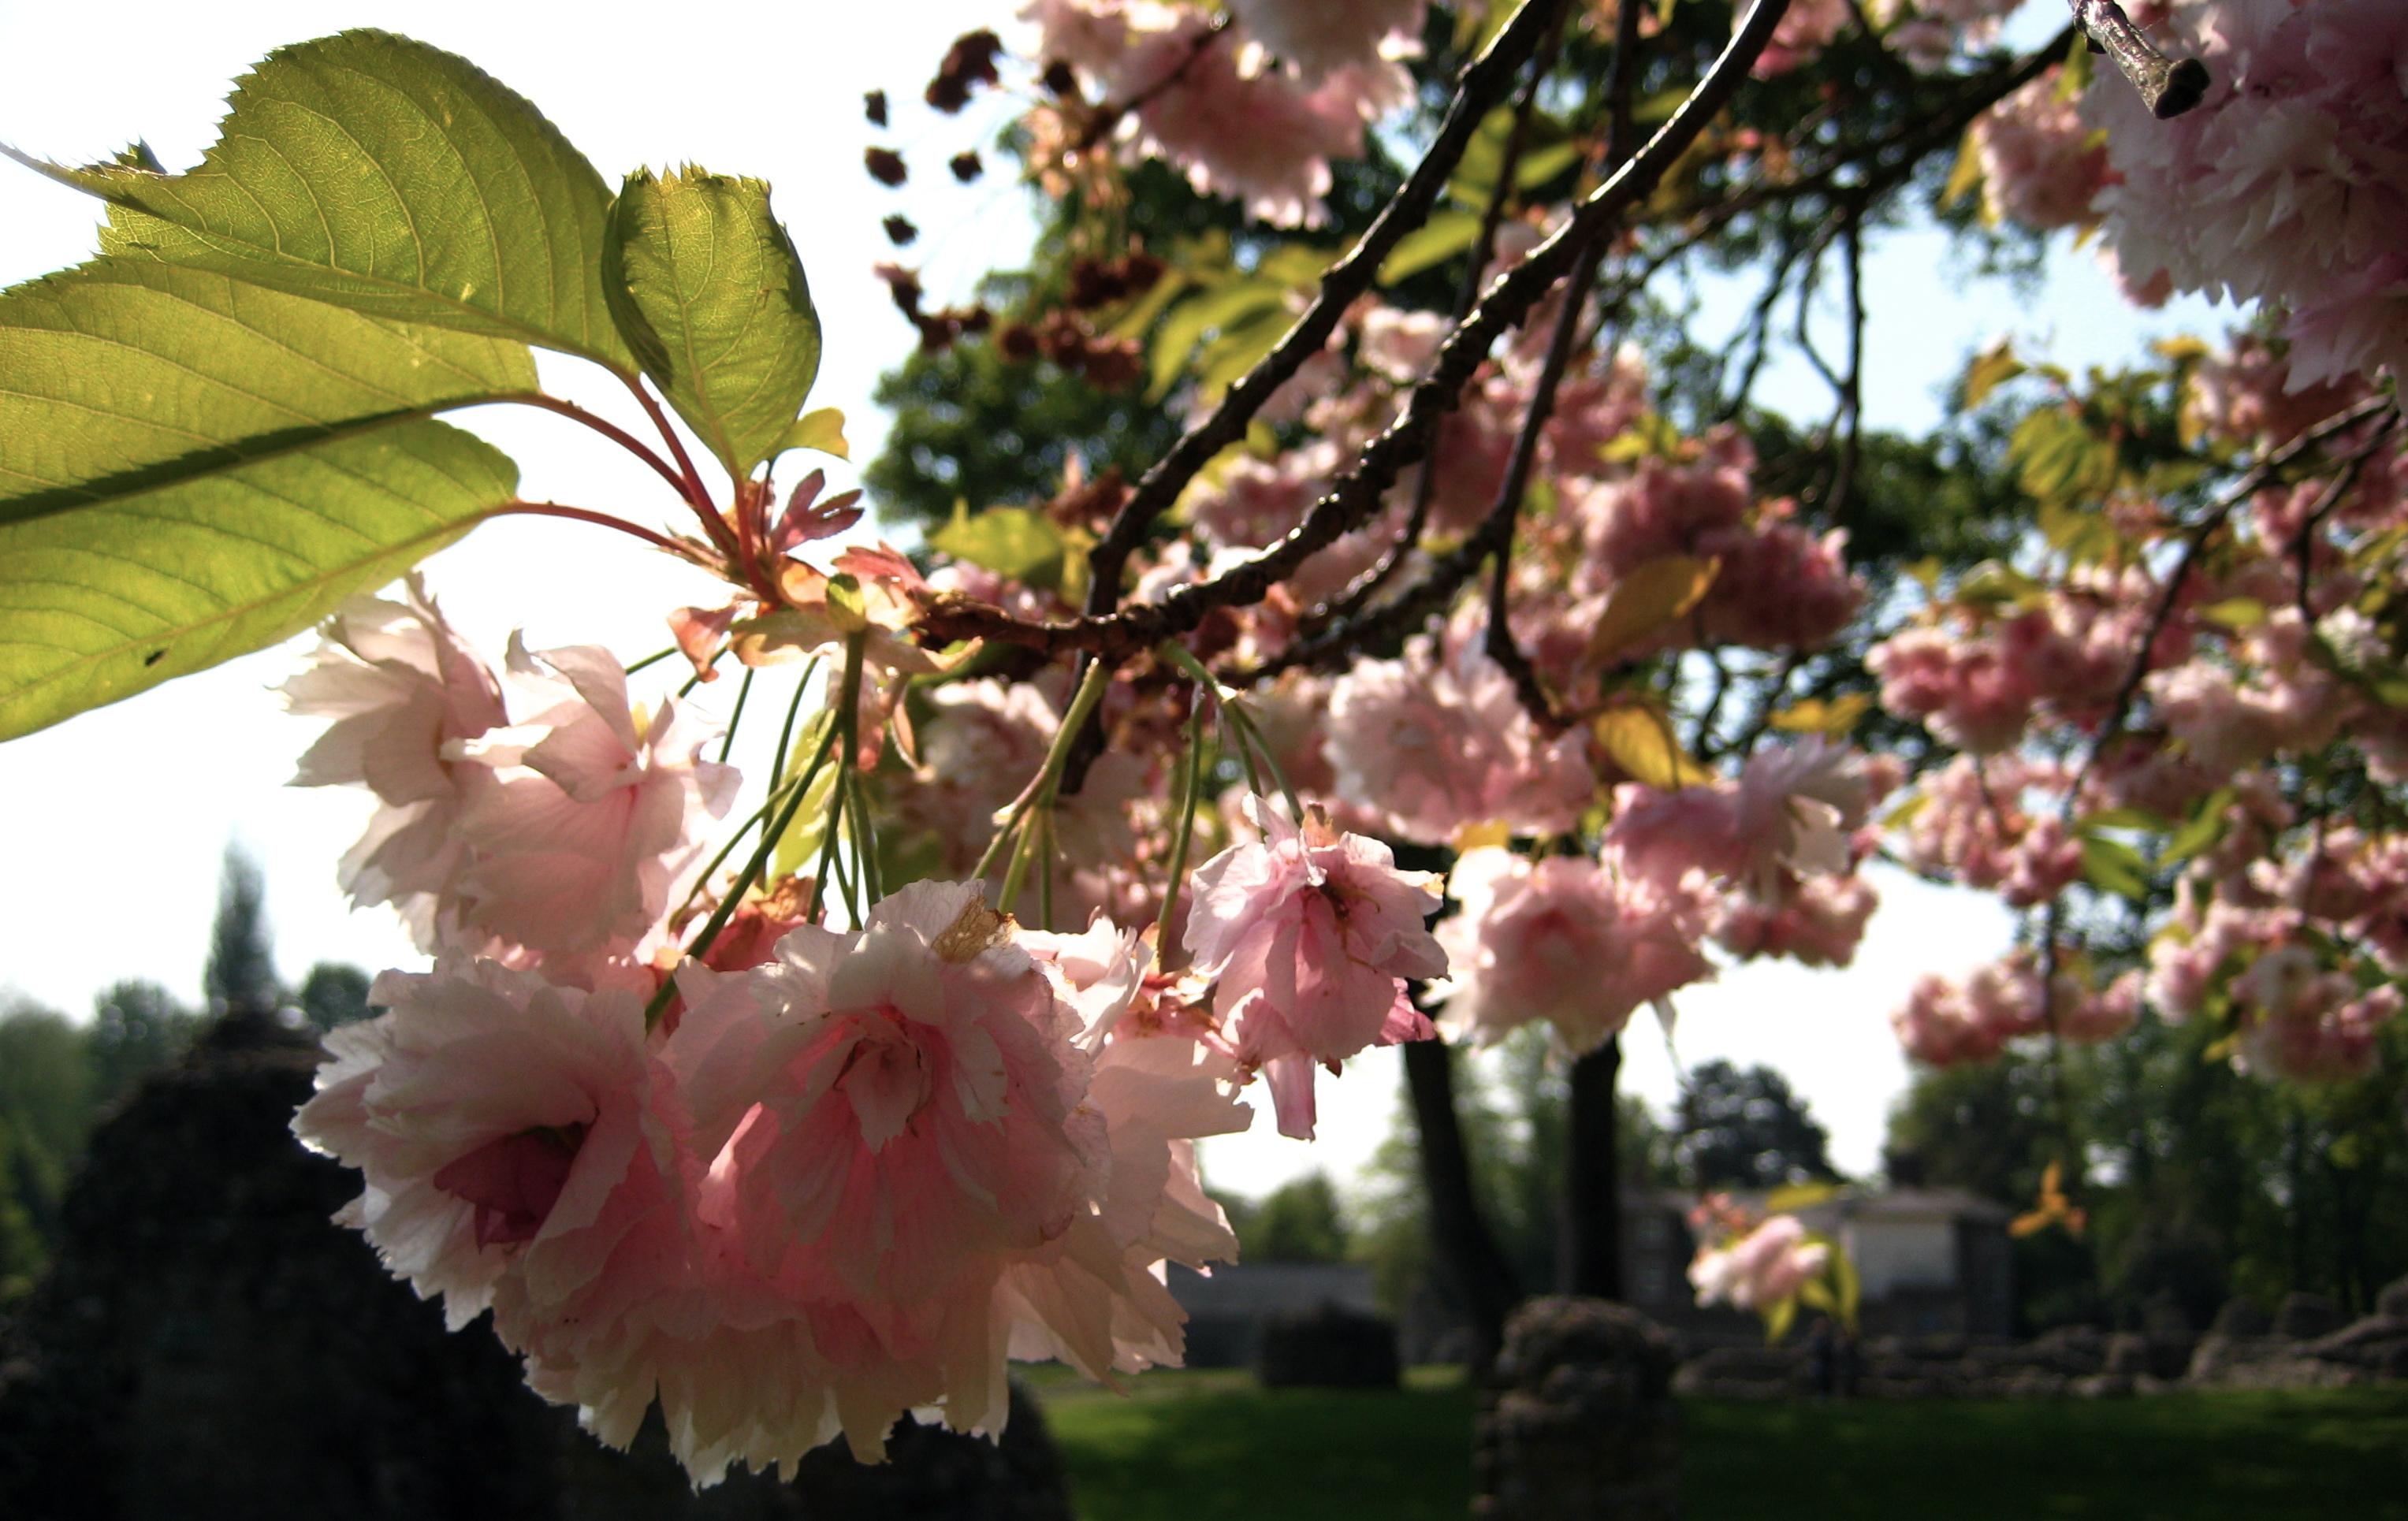 Blossoms in Bury St. Edmonds